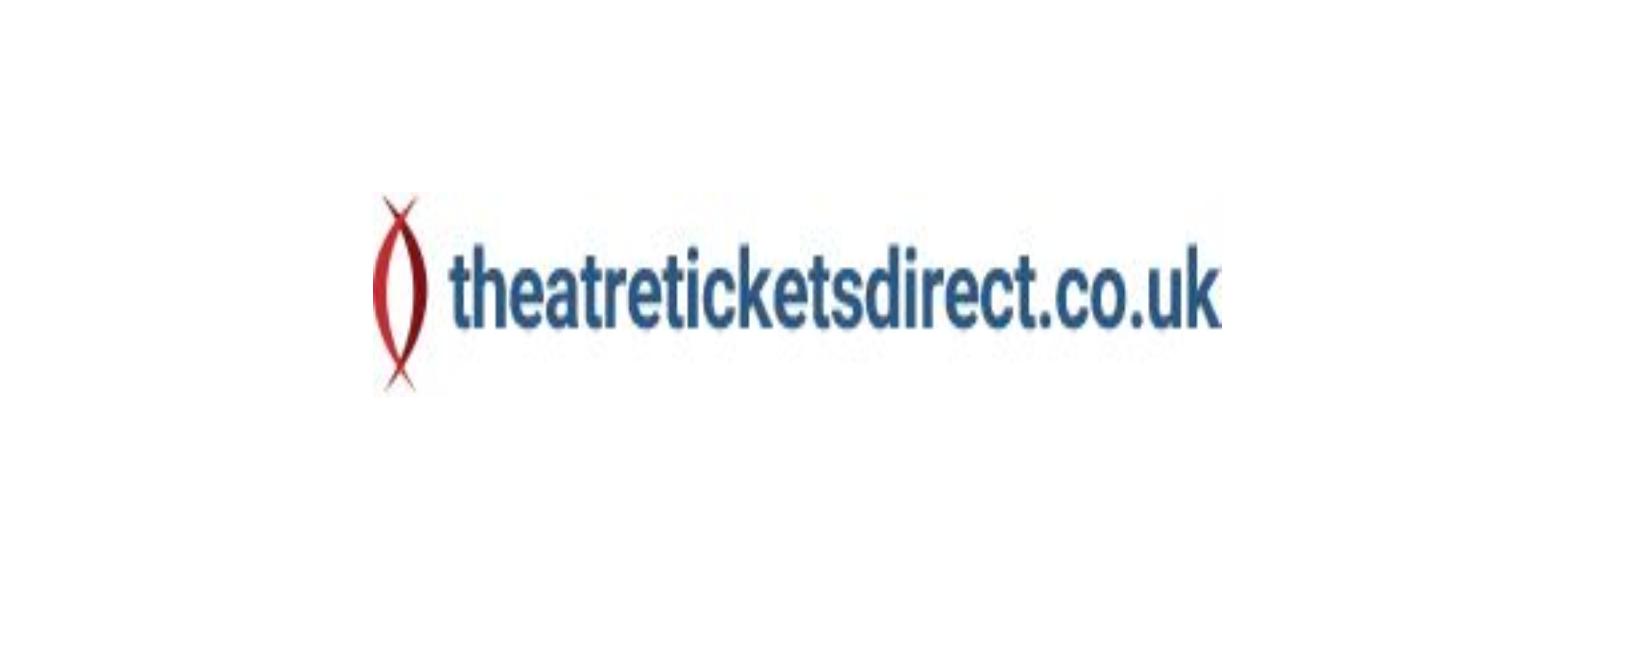 Theatre Tickets Direct UK Discount Code 2021